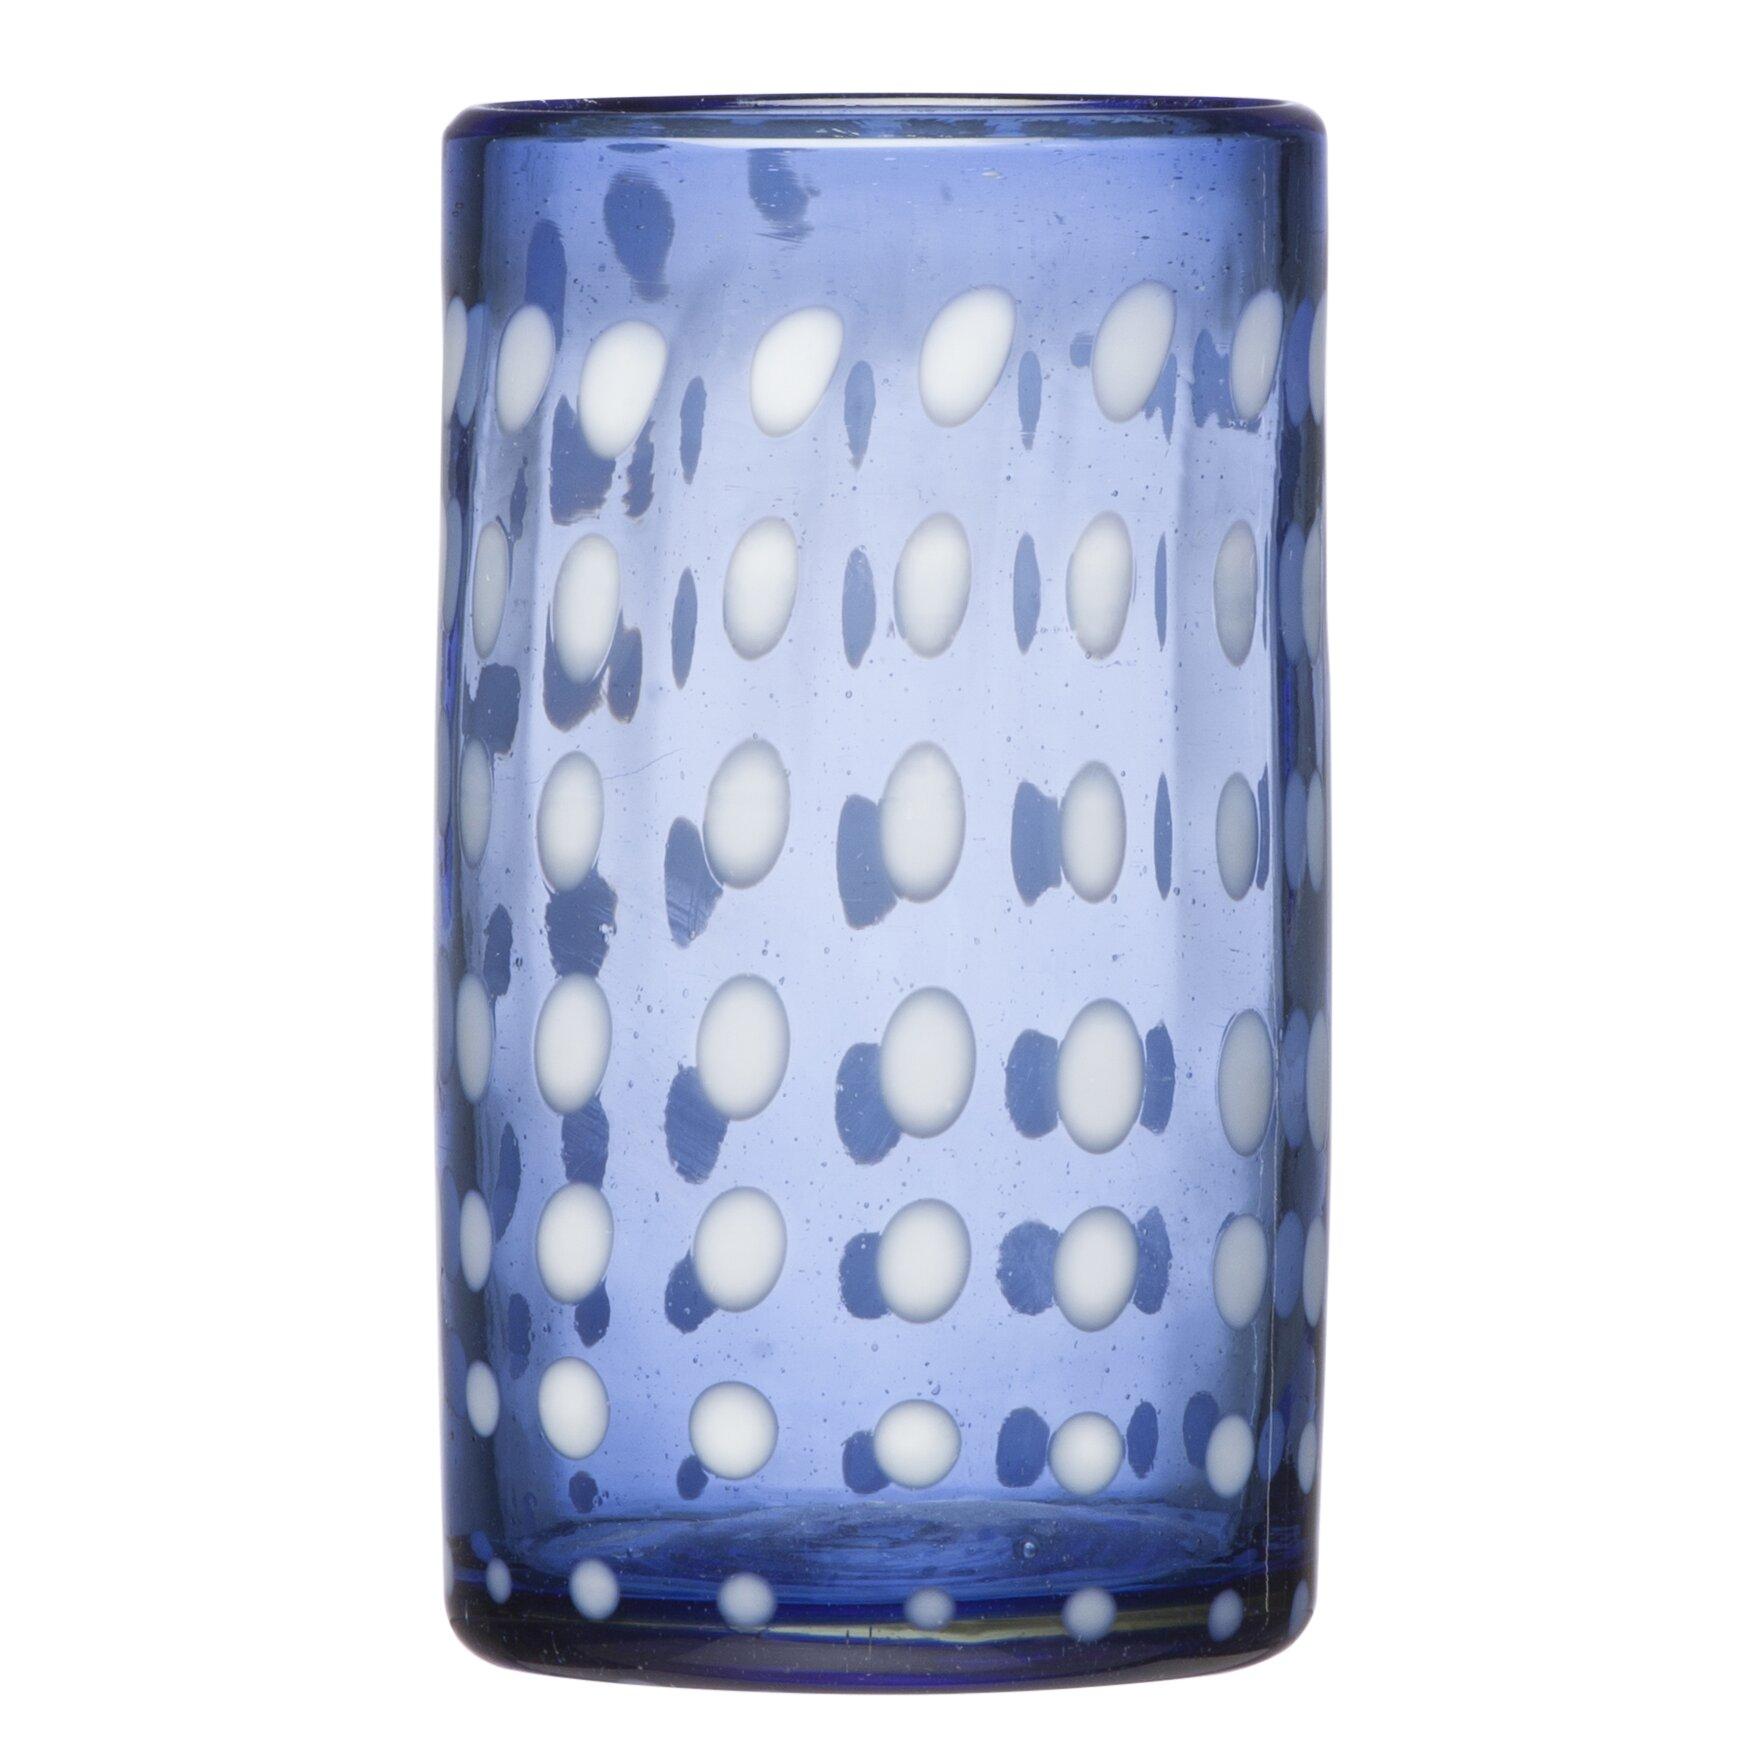 Global Amici Madrid 16 Oz Highball Glass amp Reviews Wayfair : Madrid 16 Oz Hiball 7MCR471S4R from www.wayfair.com size 1746 x 1746 jpeg 293kB